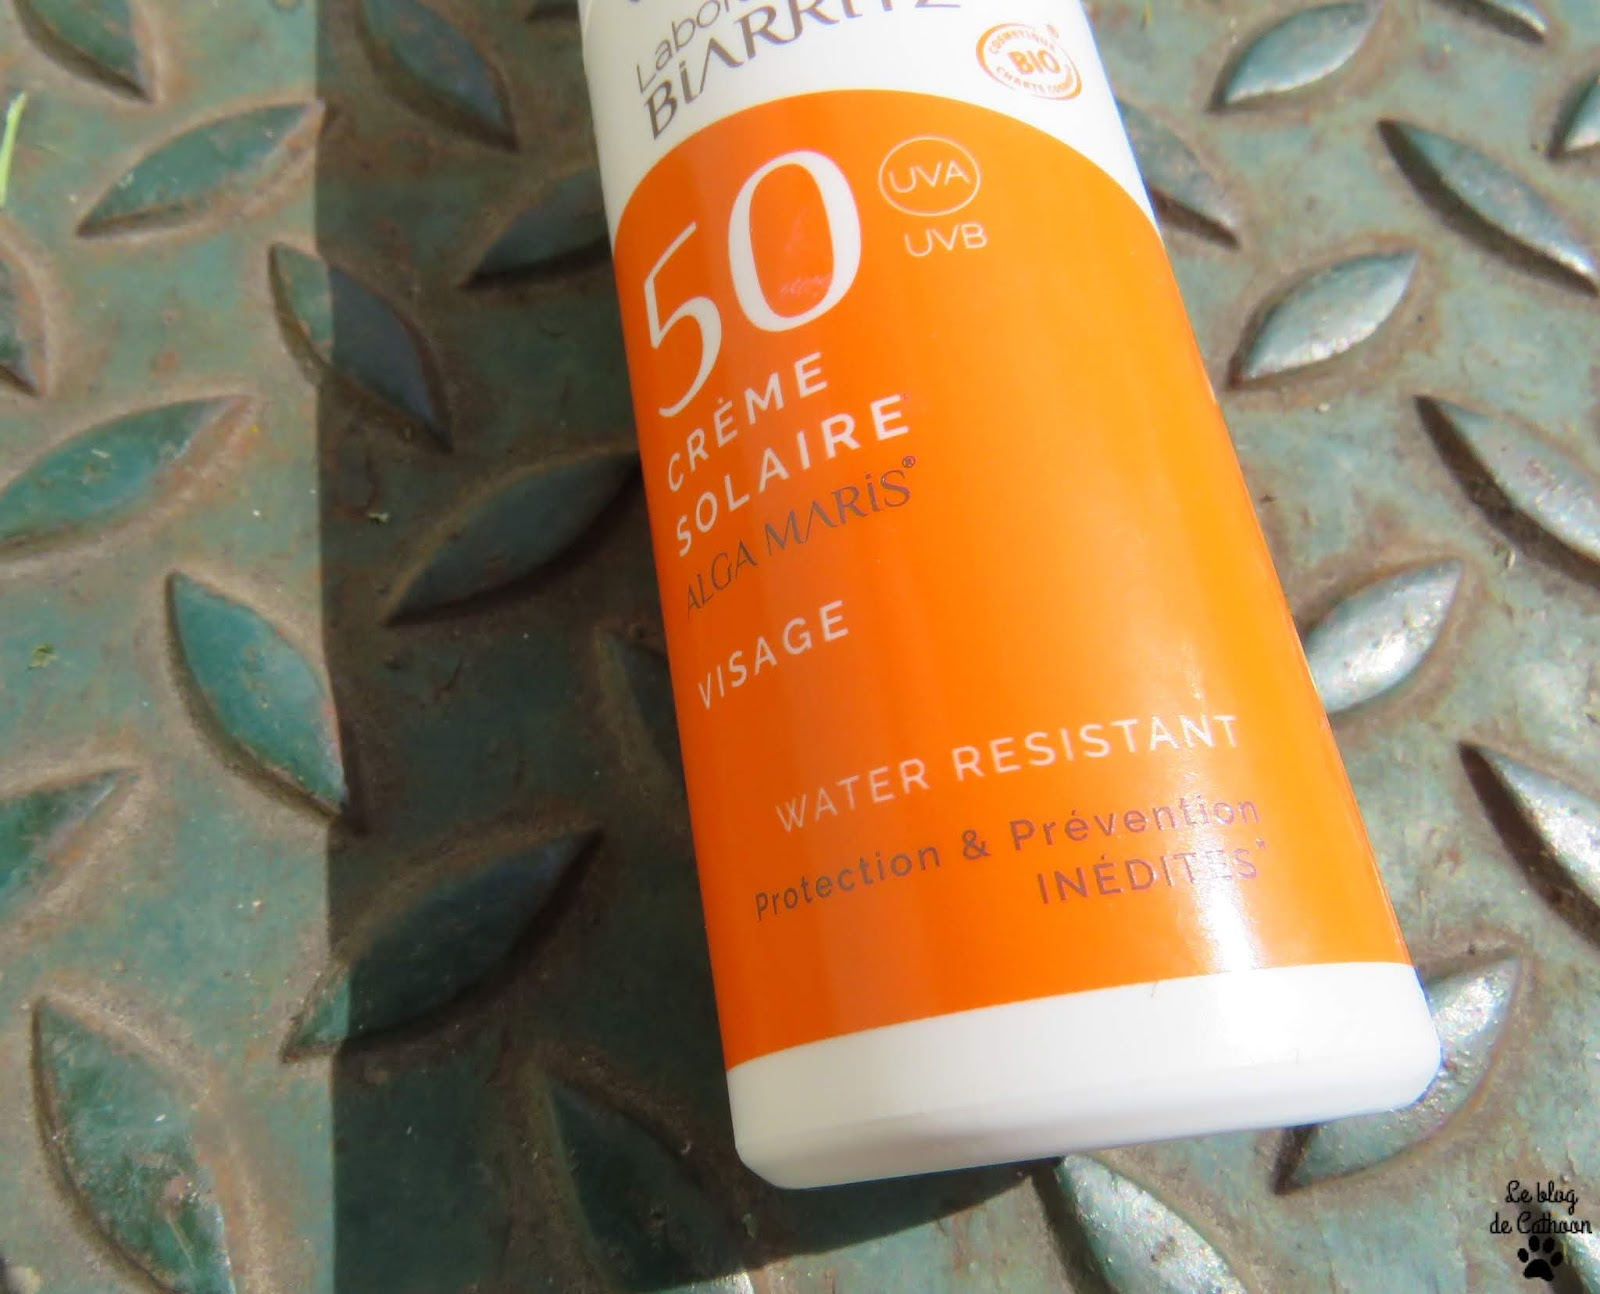 Crème Solaire 50 - Alga Maris - Laboratoires de Biarritz